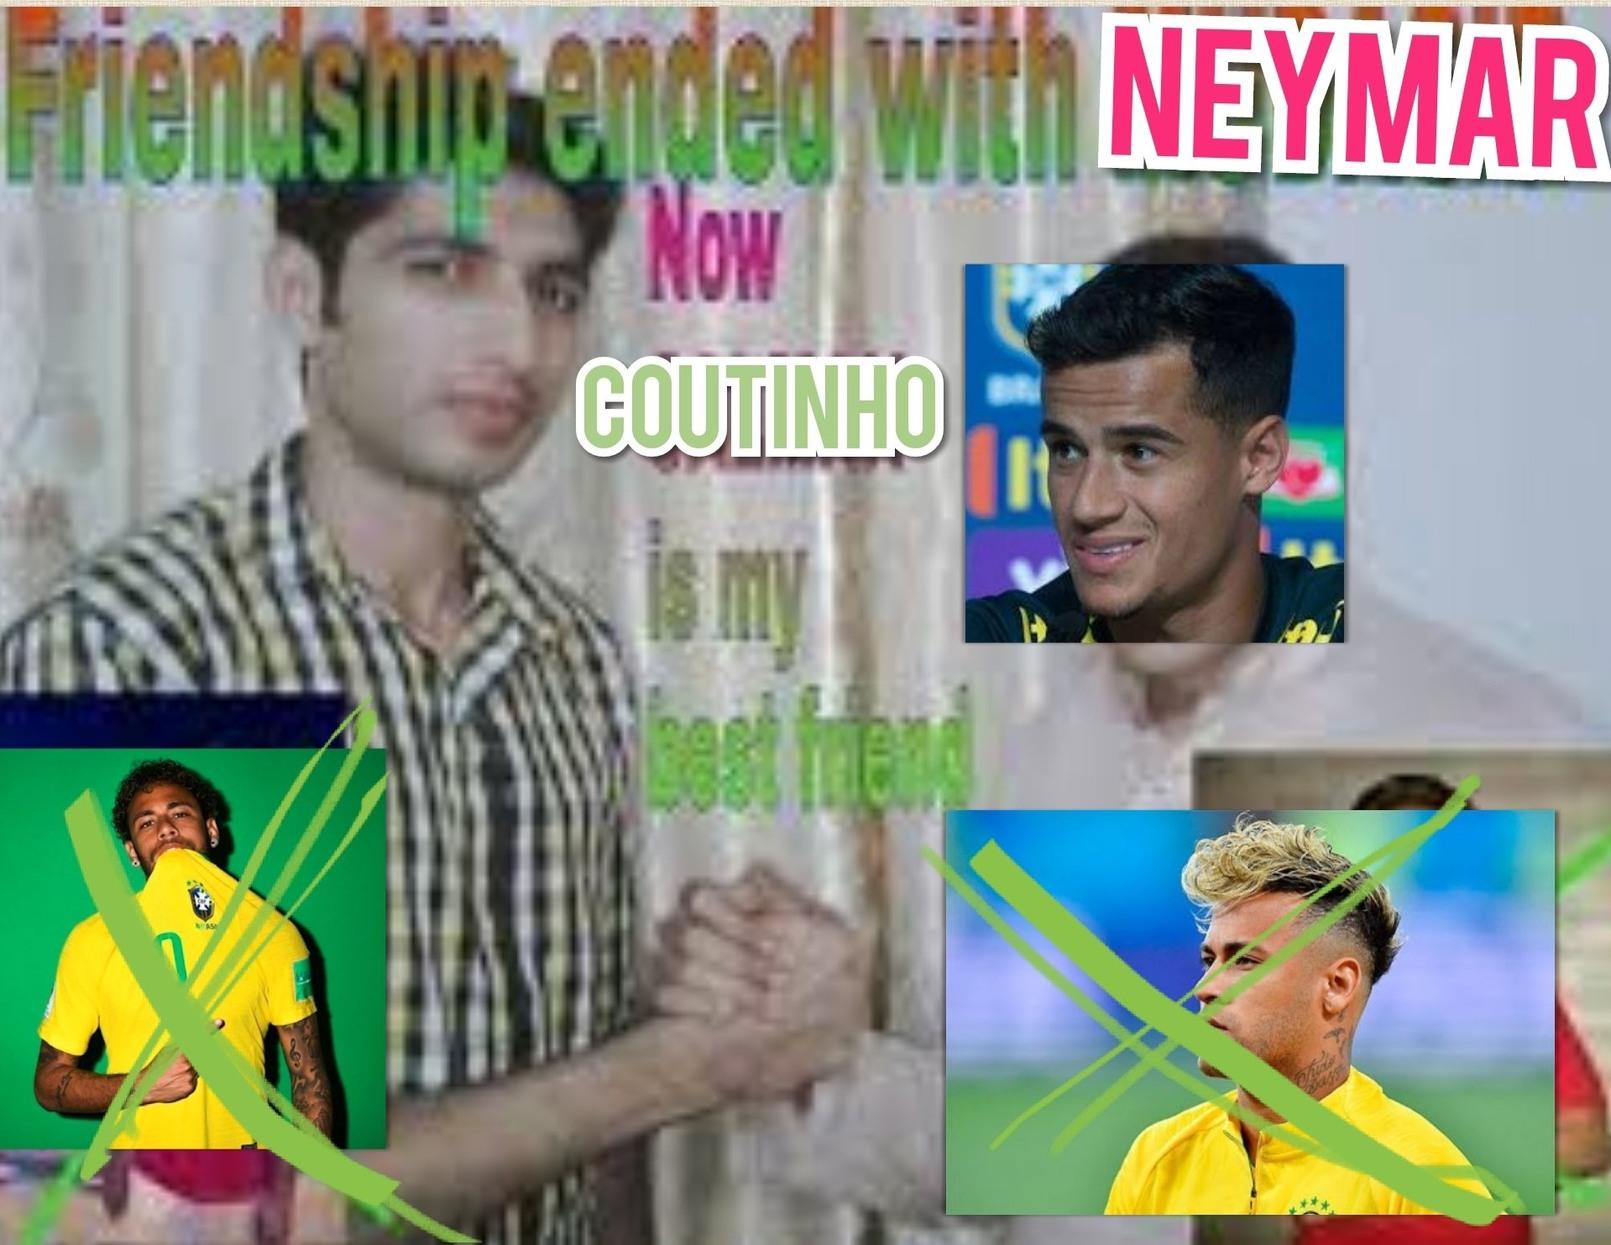 Neymar ainda é rei do br - meme